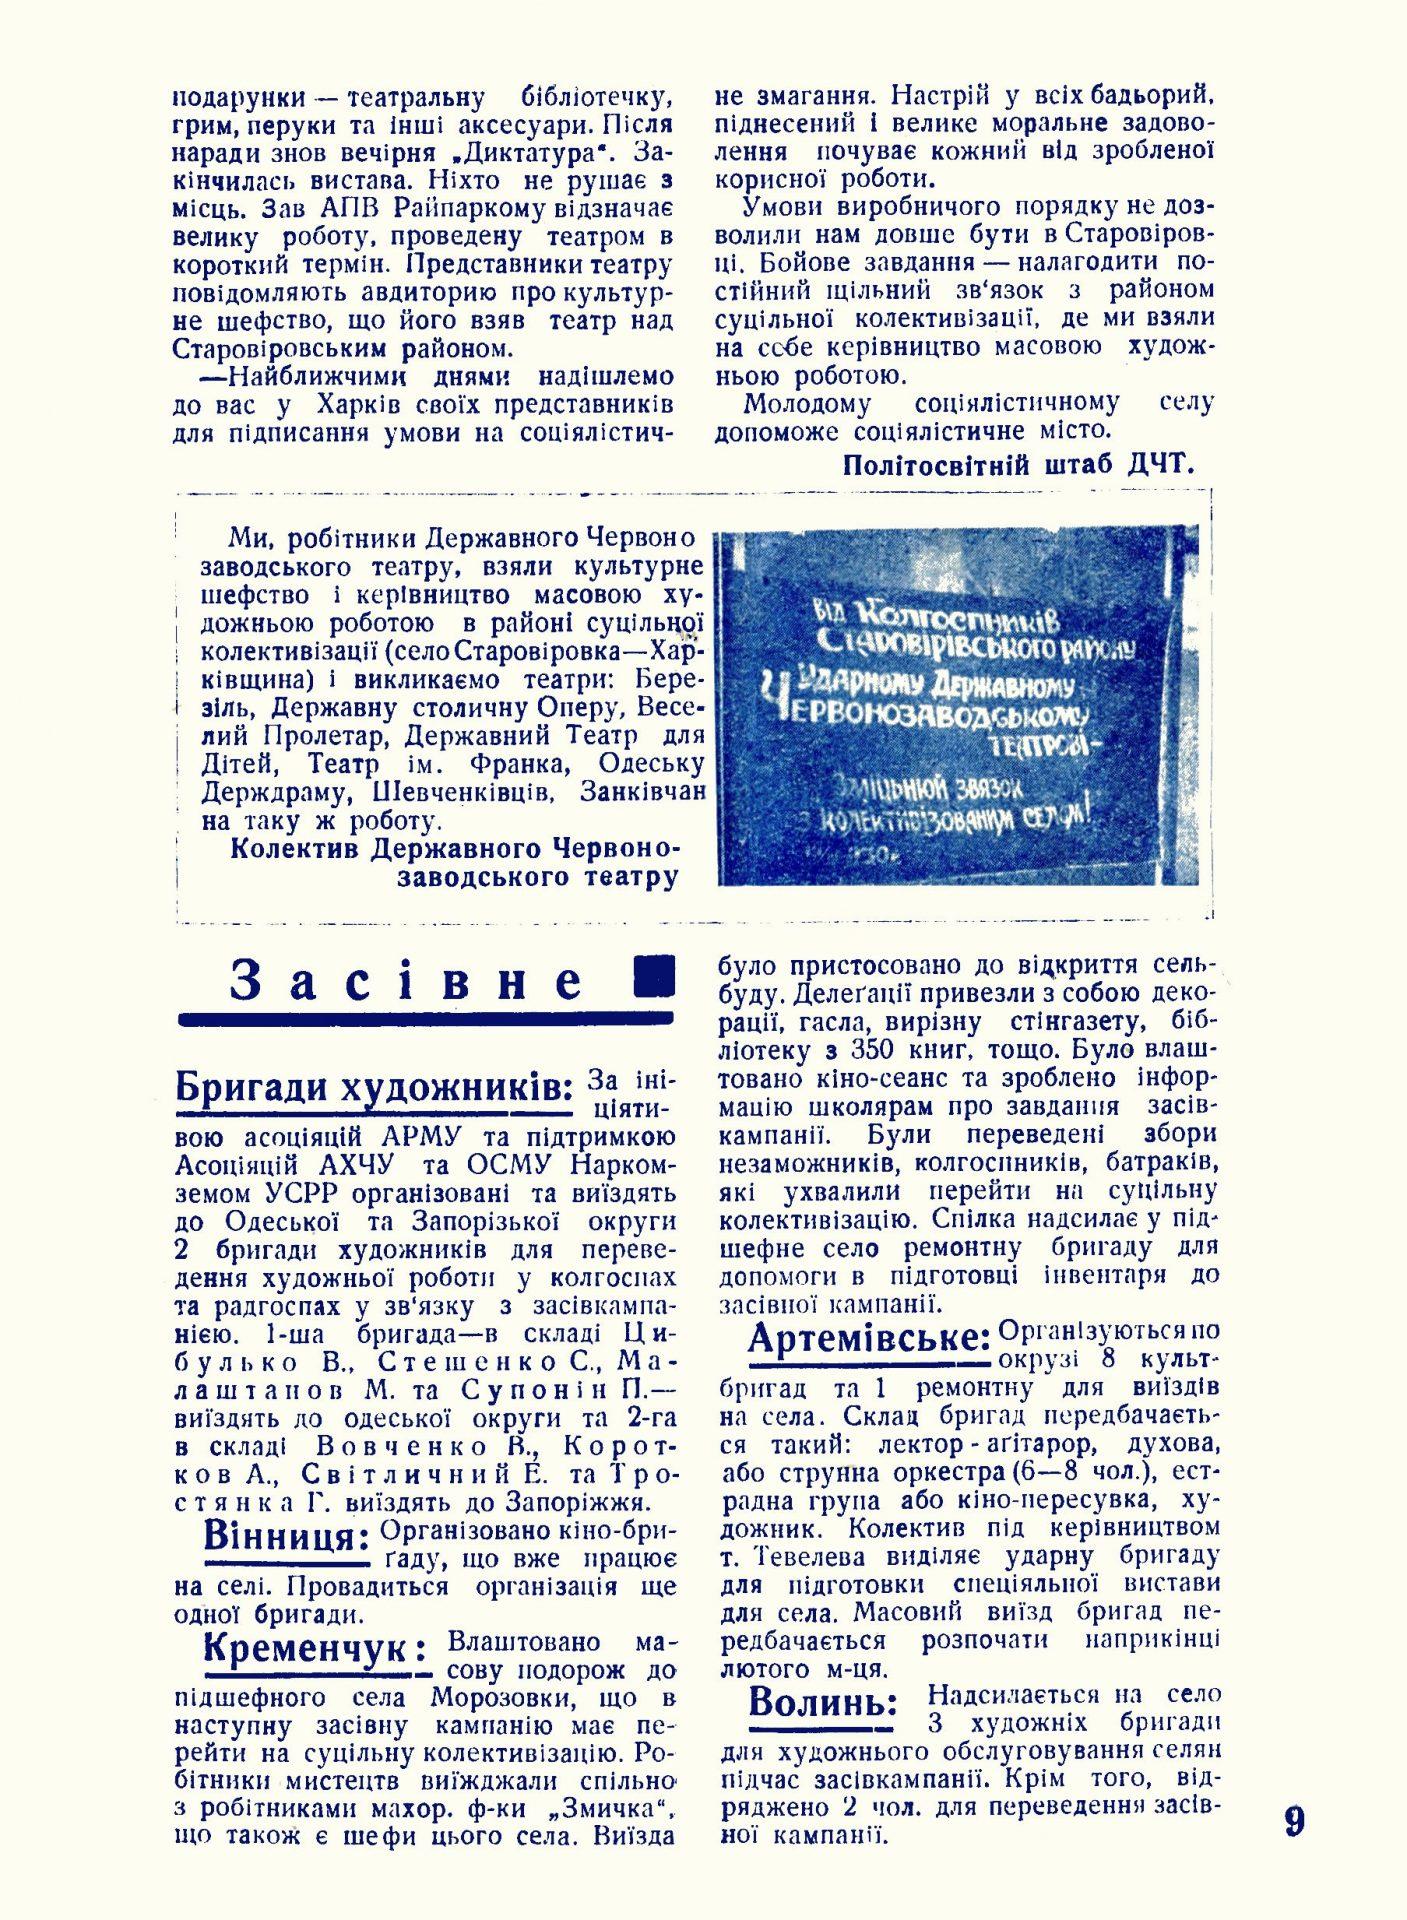 Мистецька трибуна_1930_№ 3